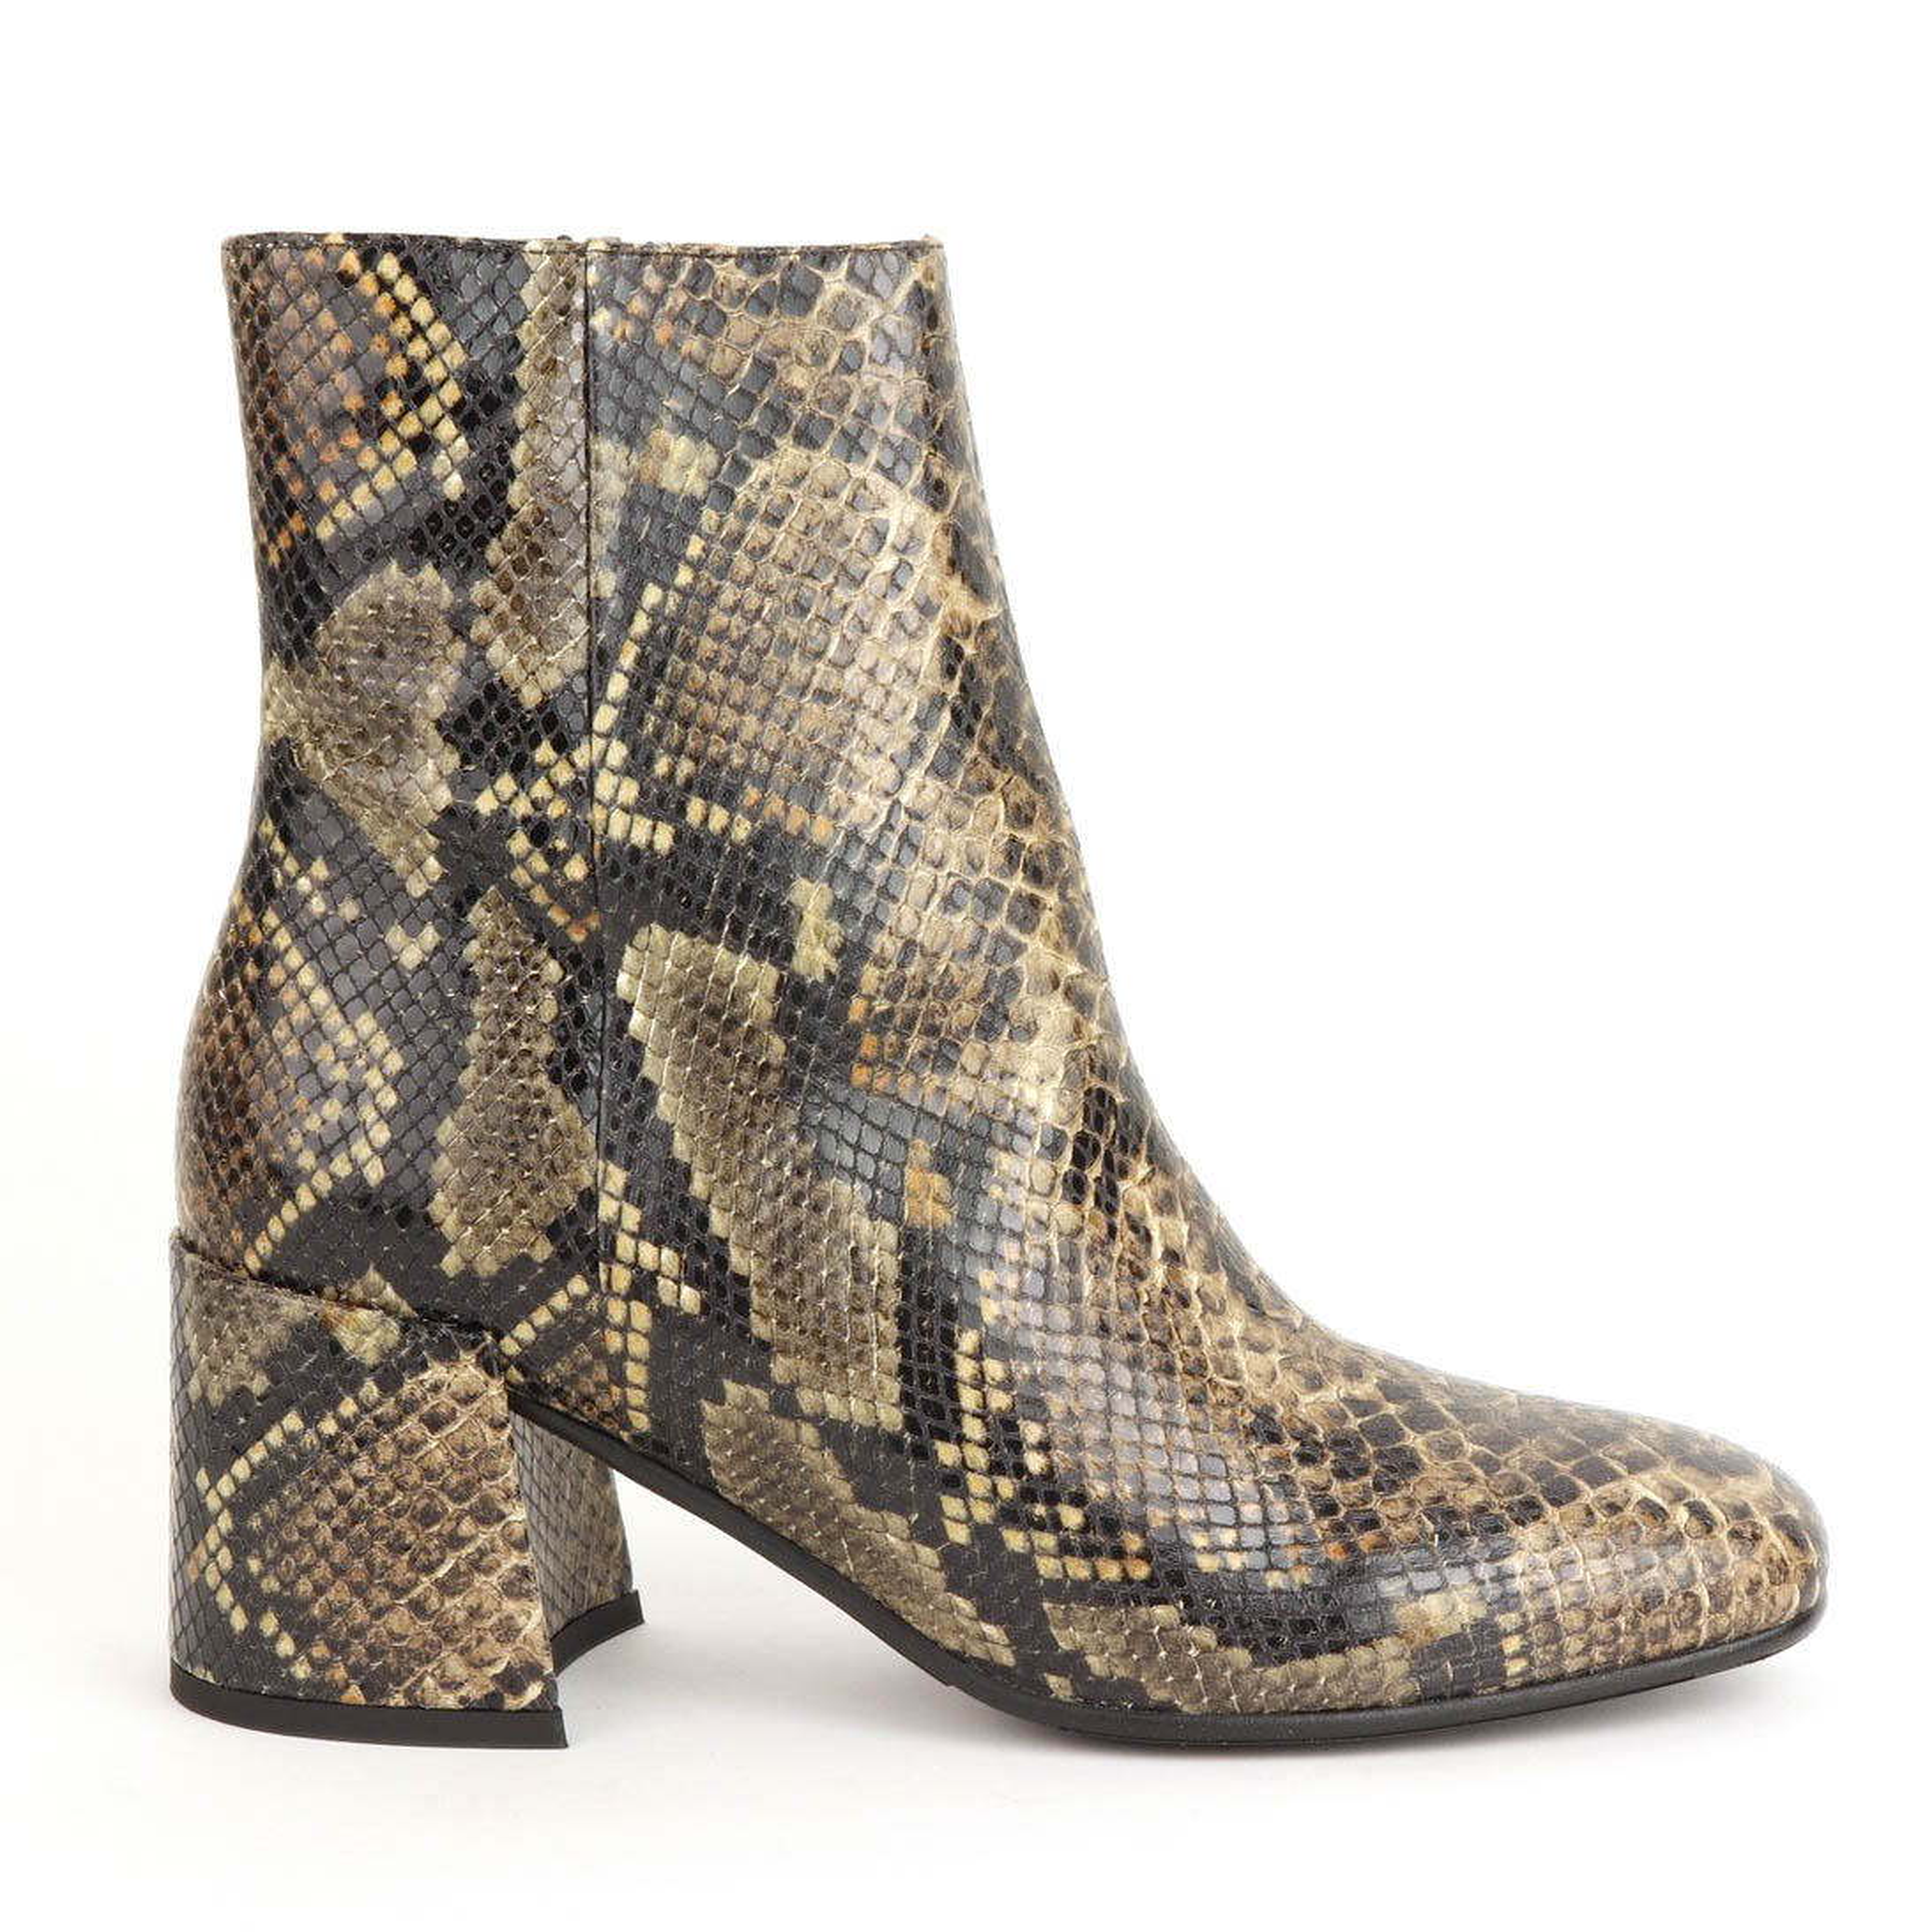 5a45e17be61 Via Vai Amelia Catch 5101101-00-005 order online   Oxener Shoes